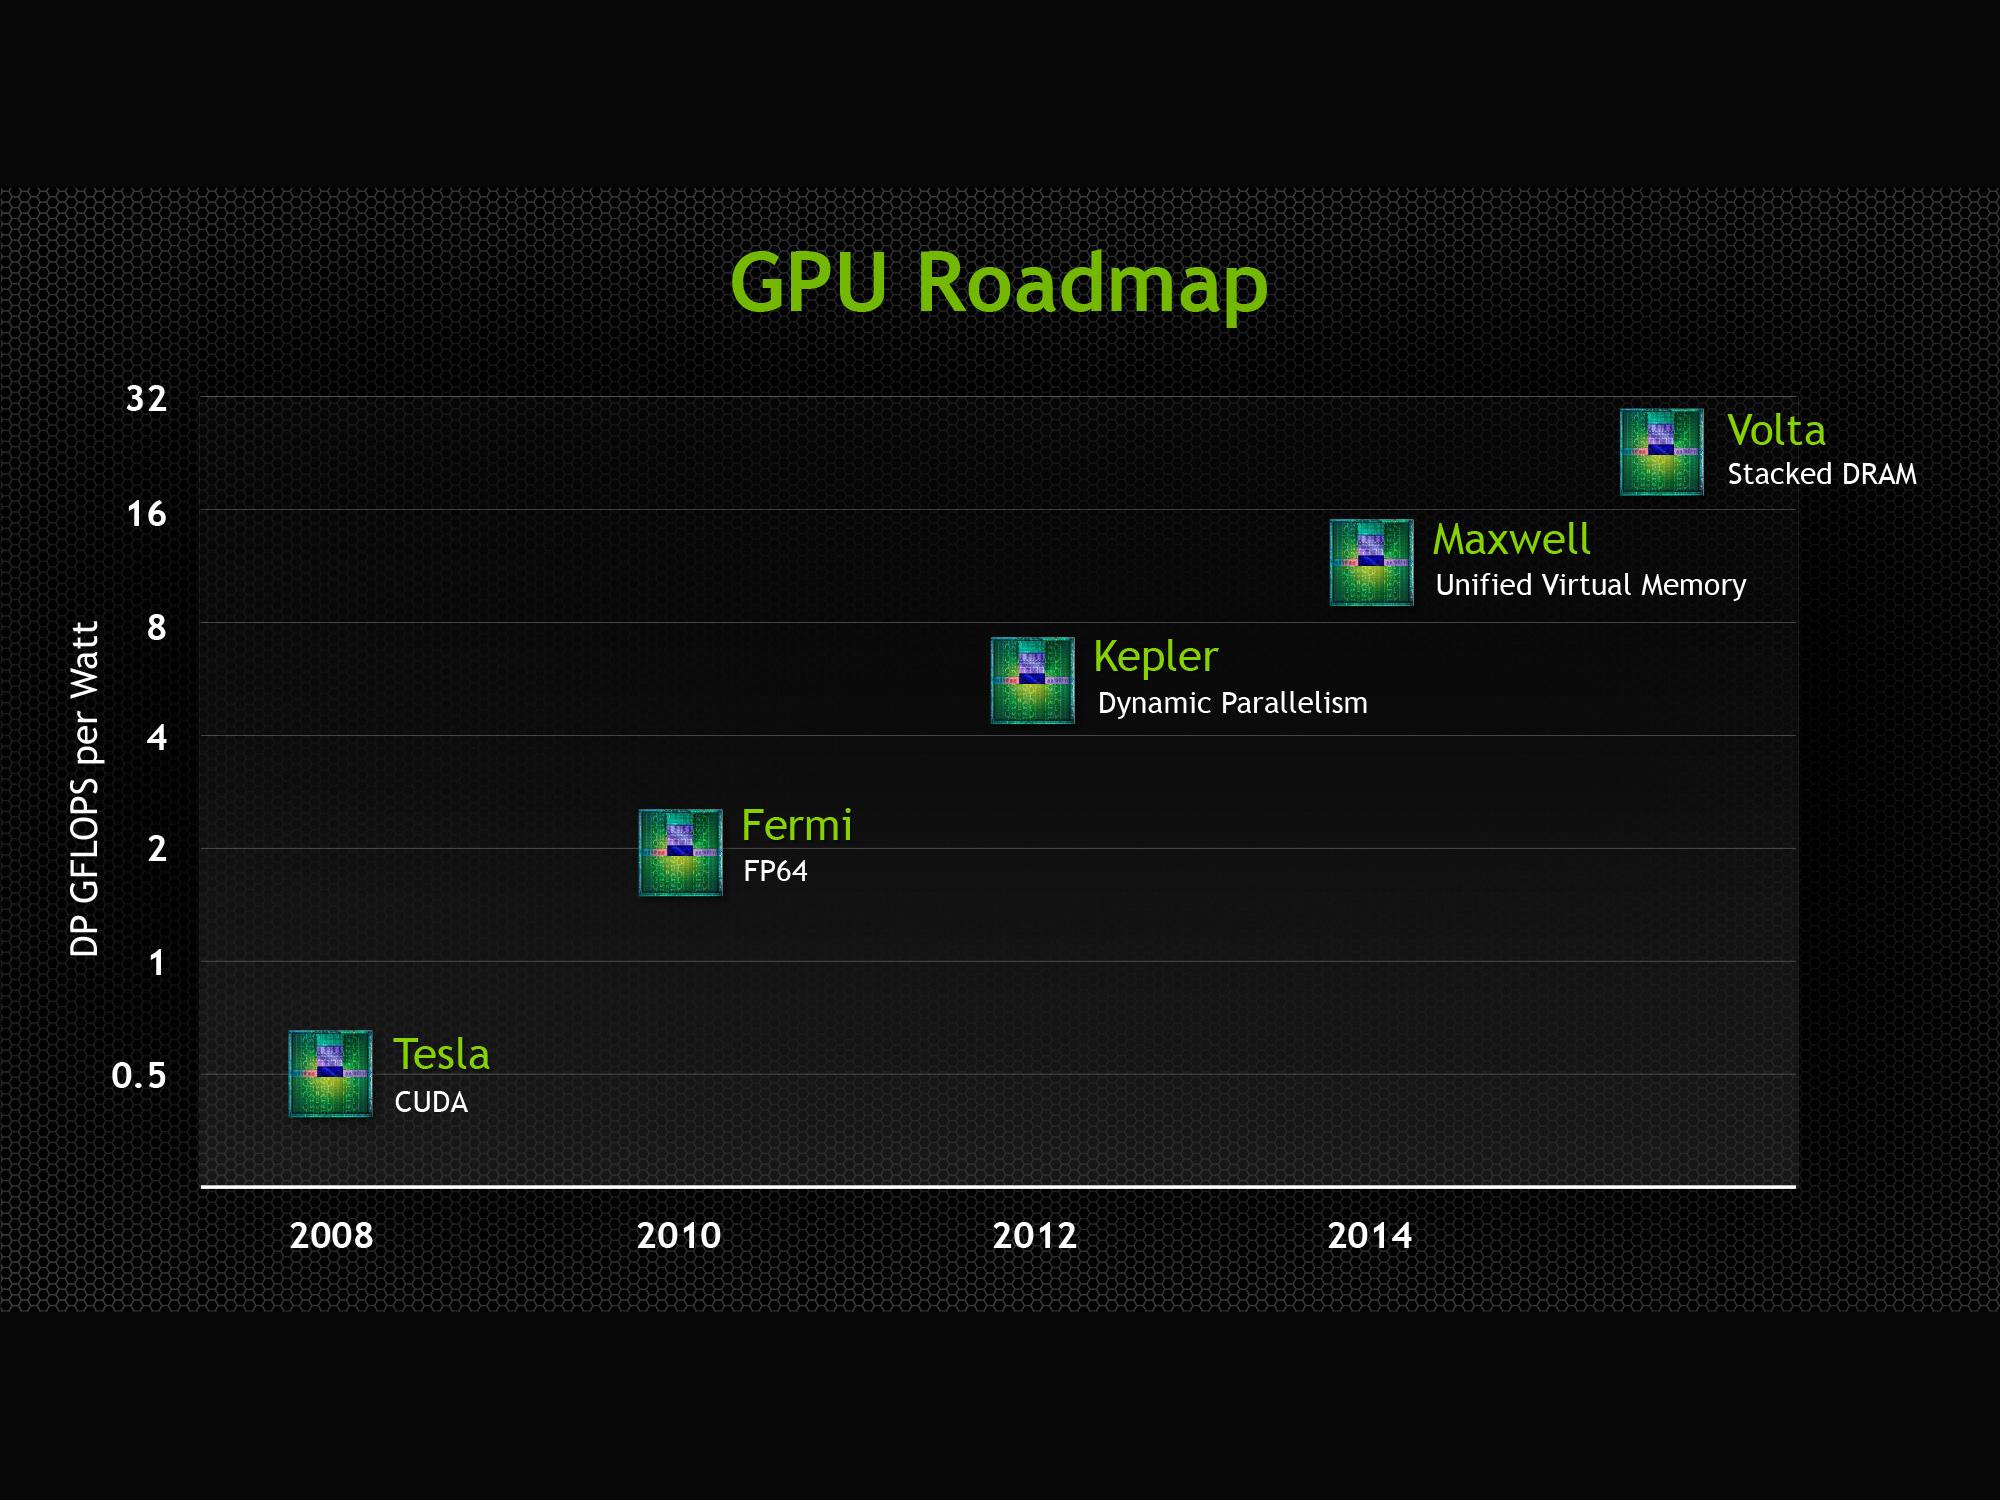 nvidia-previous-roadmap.jpg